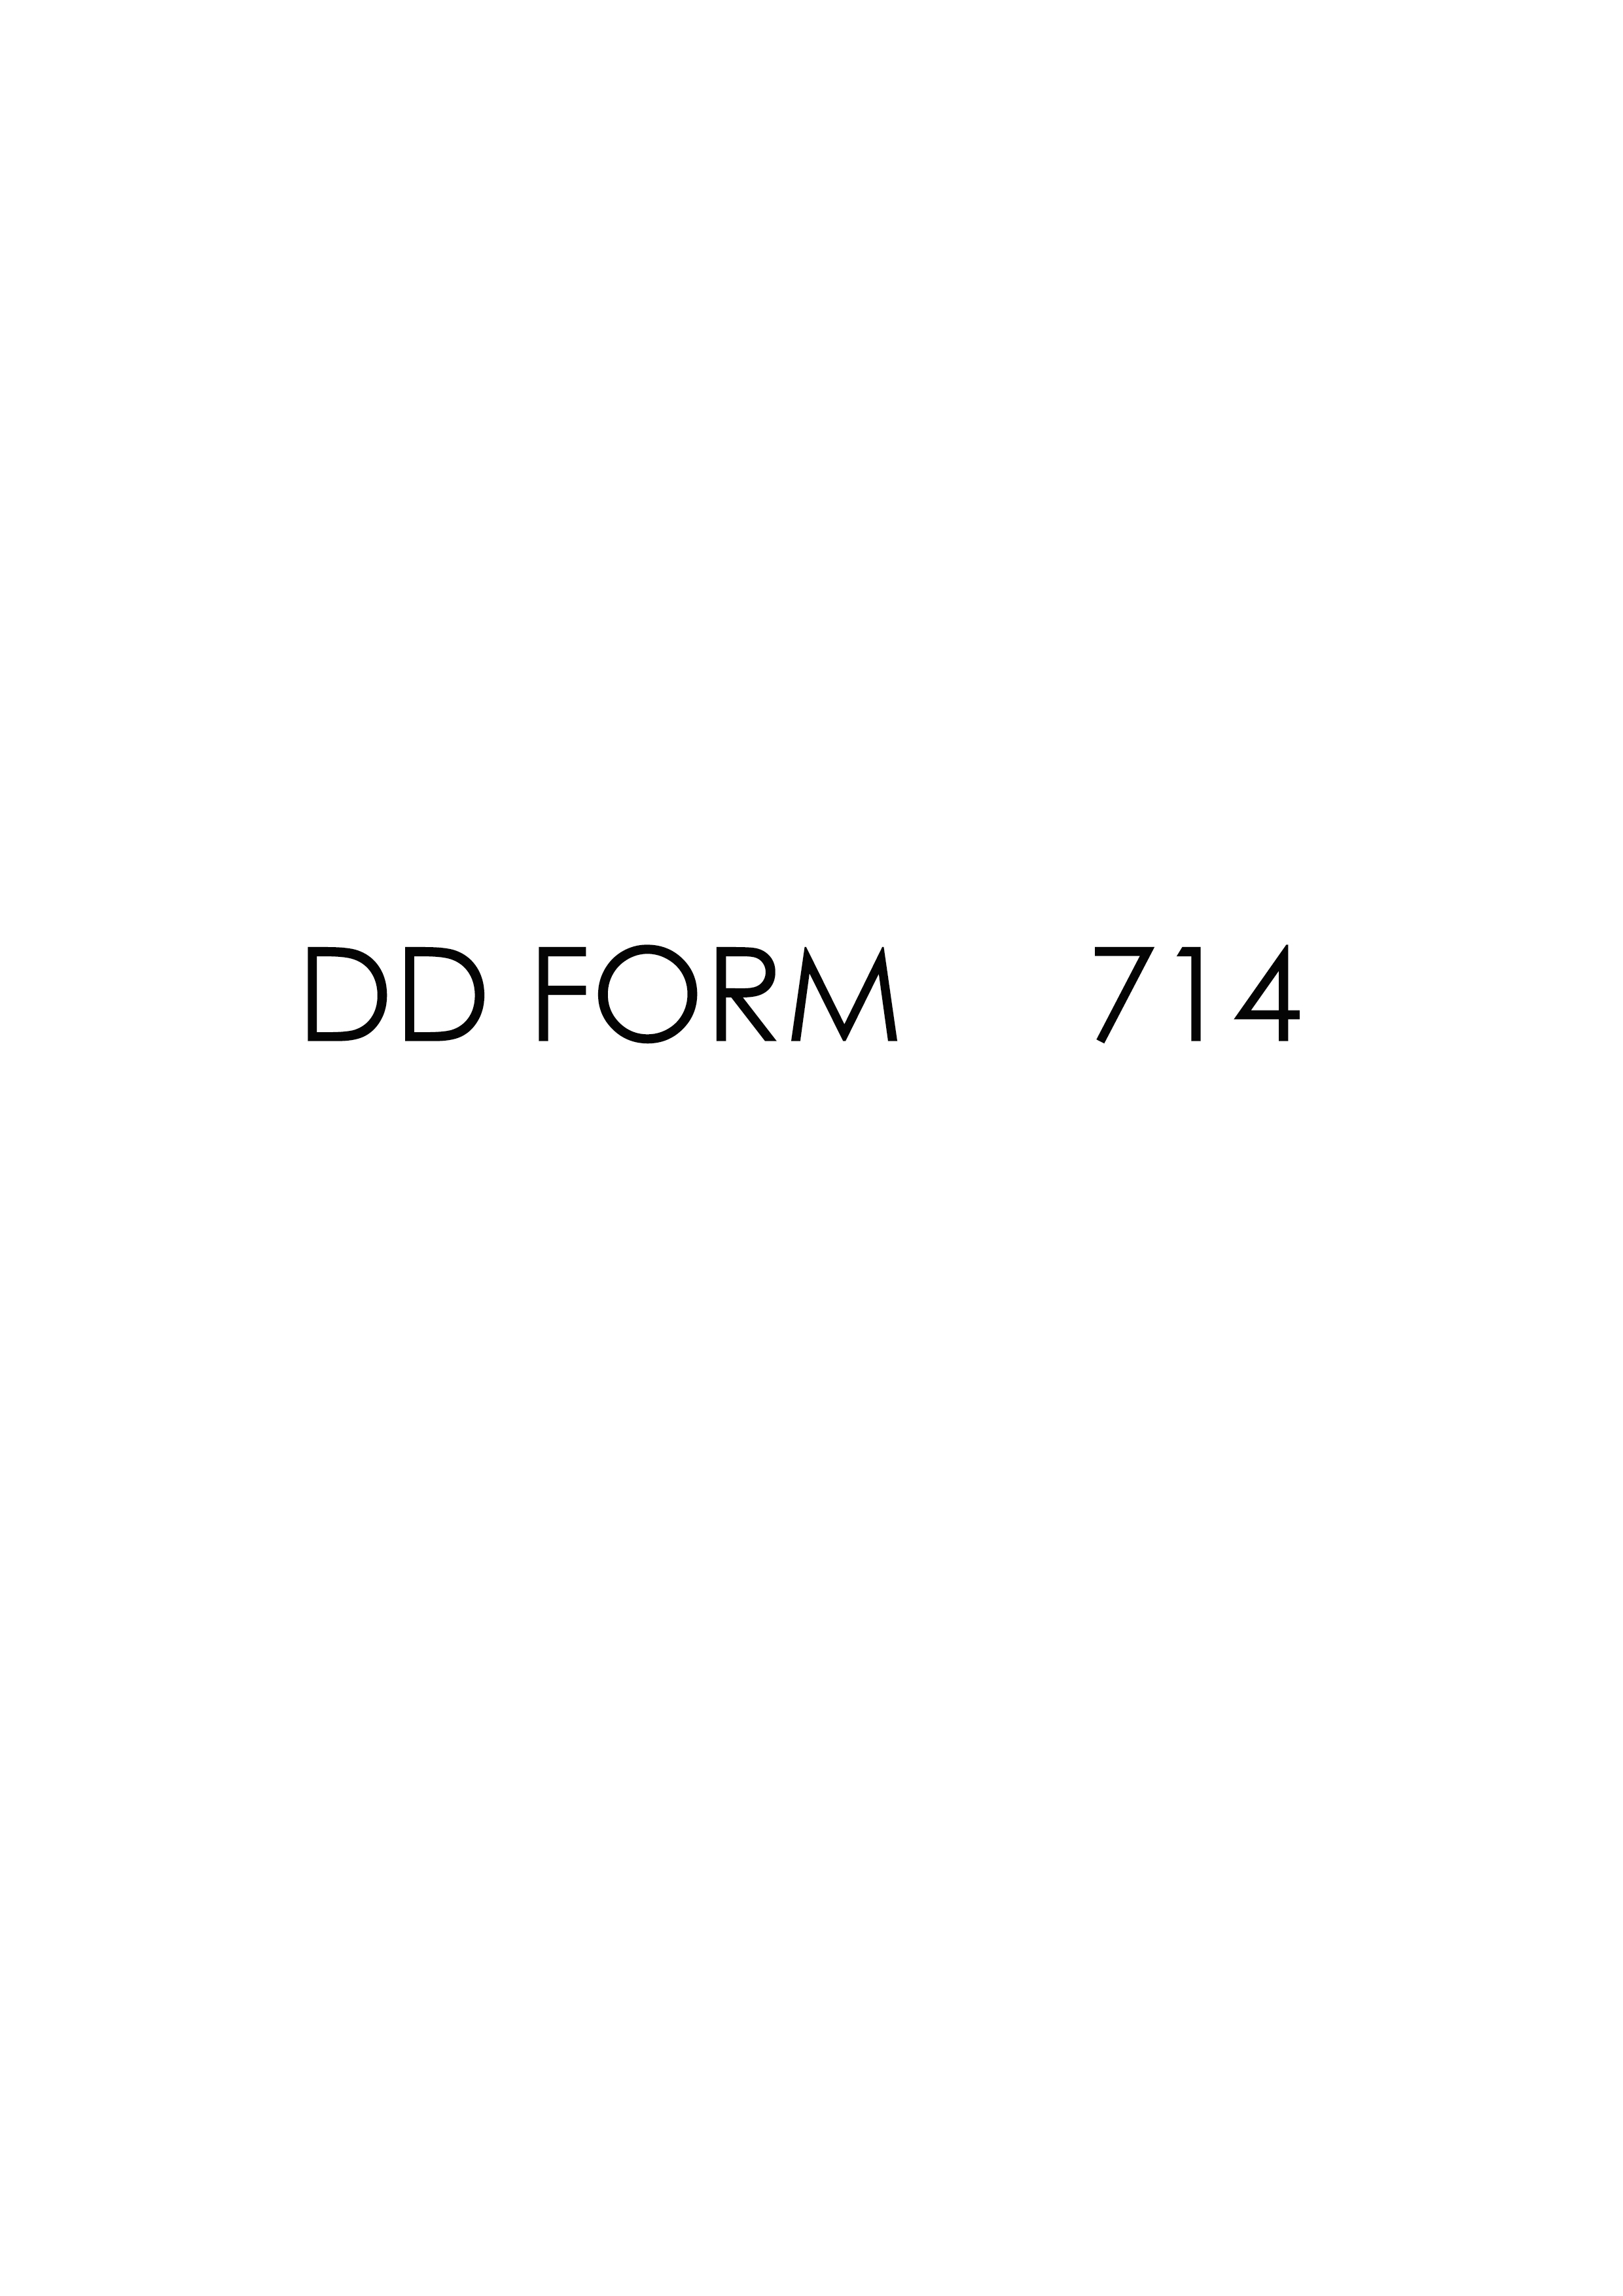 Download dd Form 714 Free